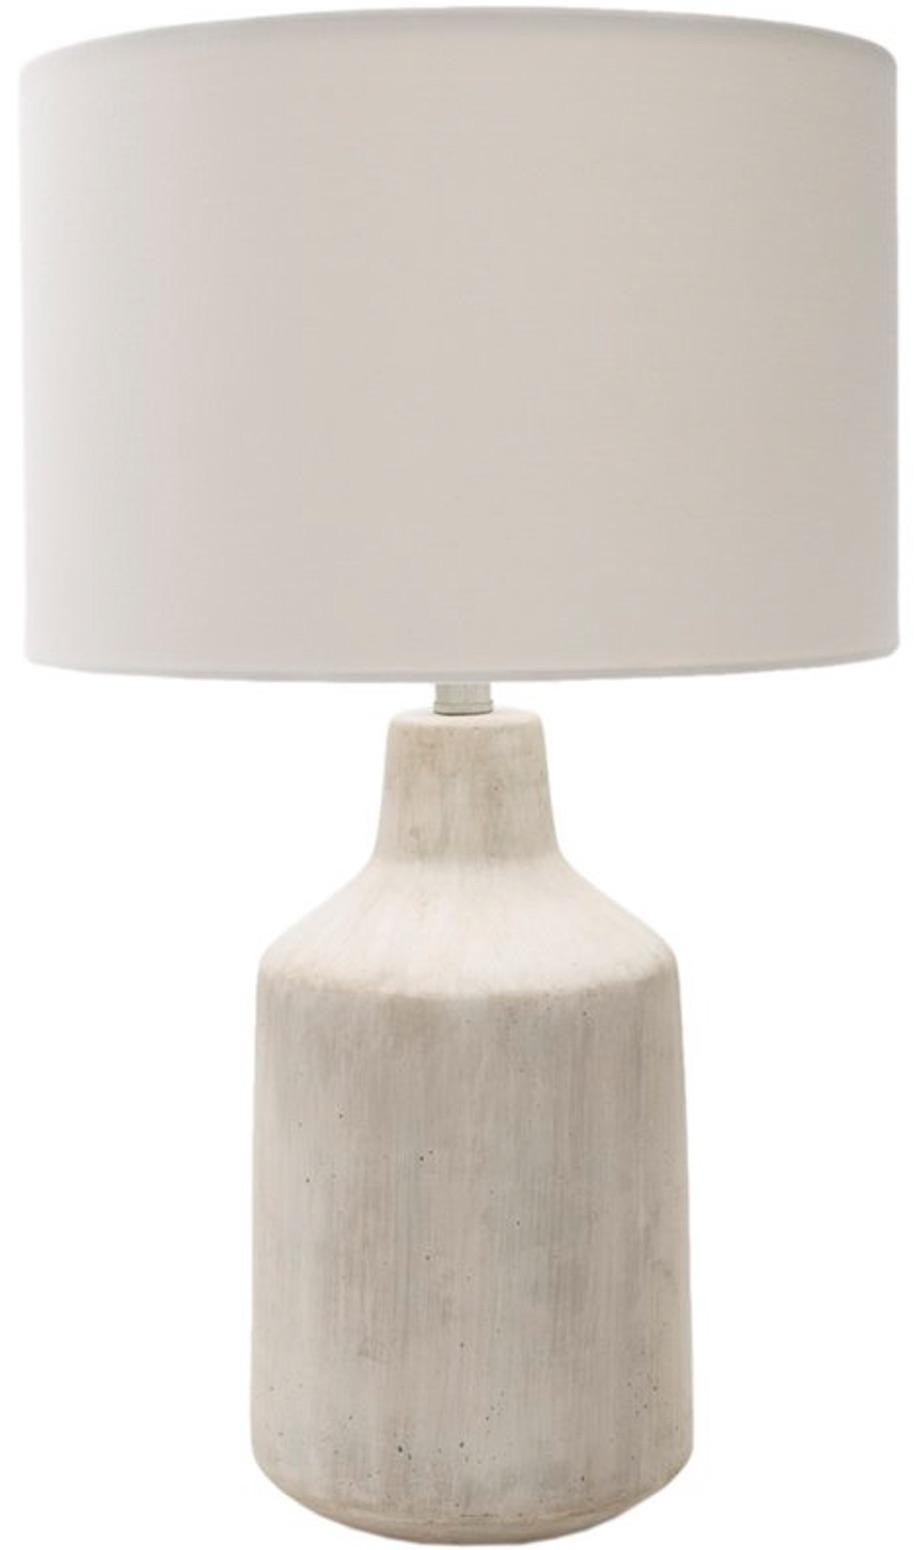 33 Simple Farmhouse Table Lamps Alina Table Lamp #Farmhouse #FarmhouseTableLamps #FarmhouseLighting #RusticDecor #CountryDecor #FarmhouseDecor